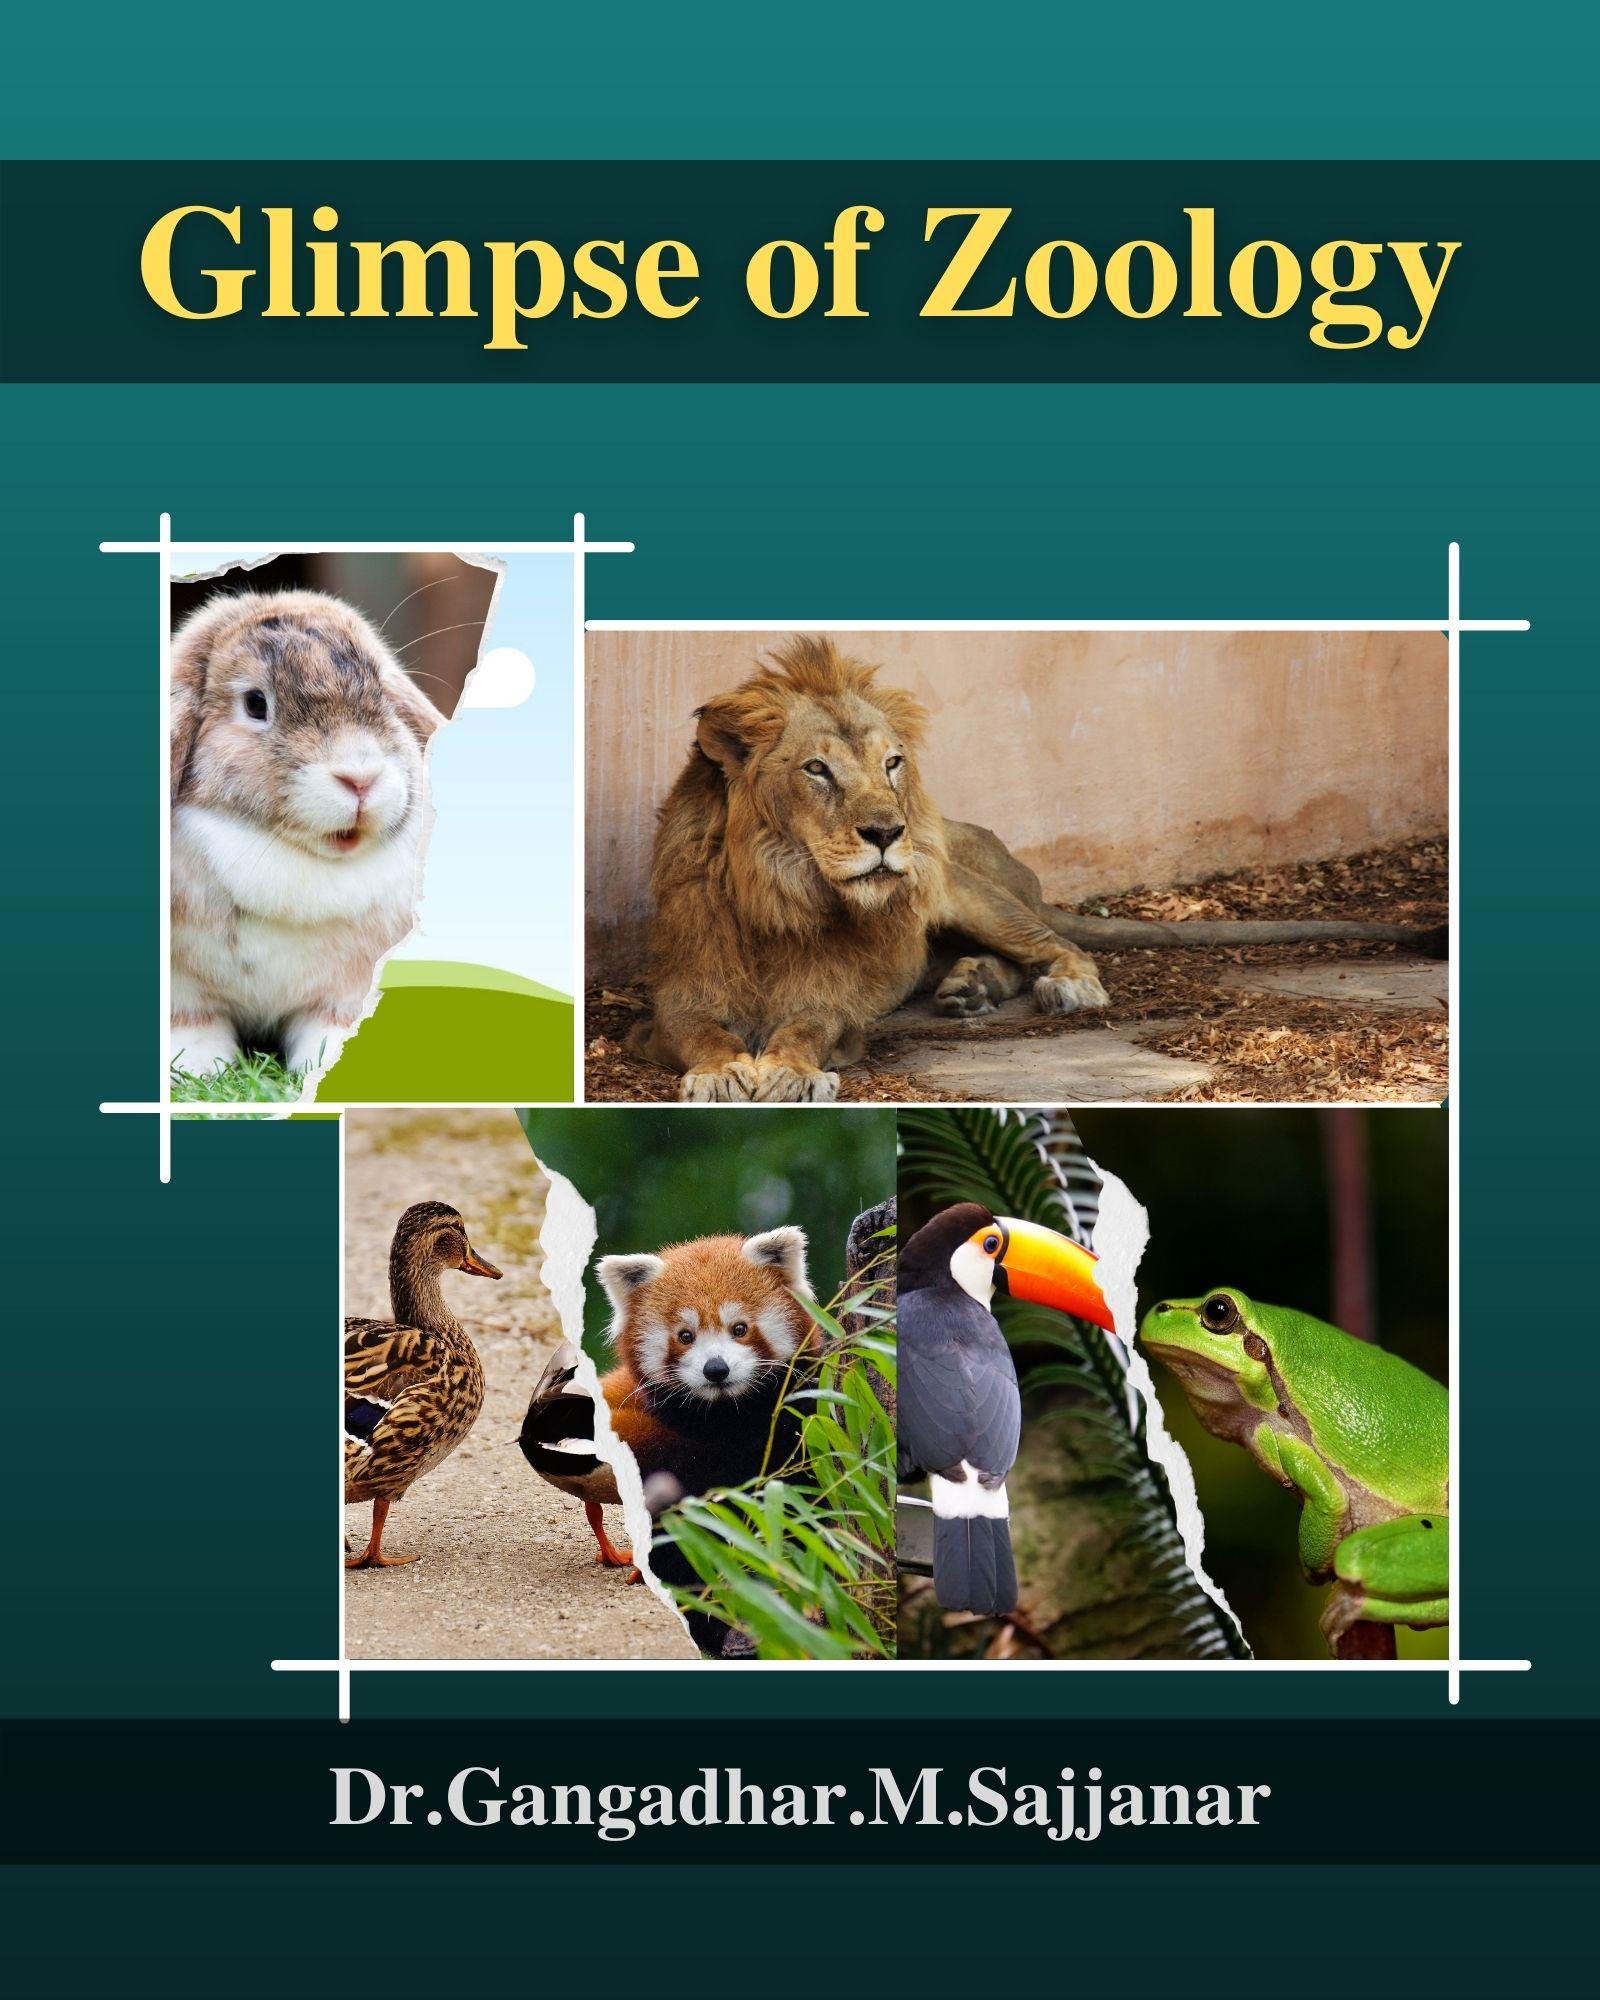 Glimpse of Zoology